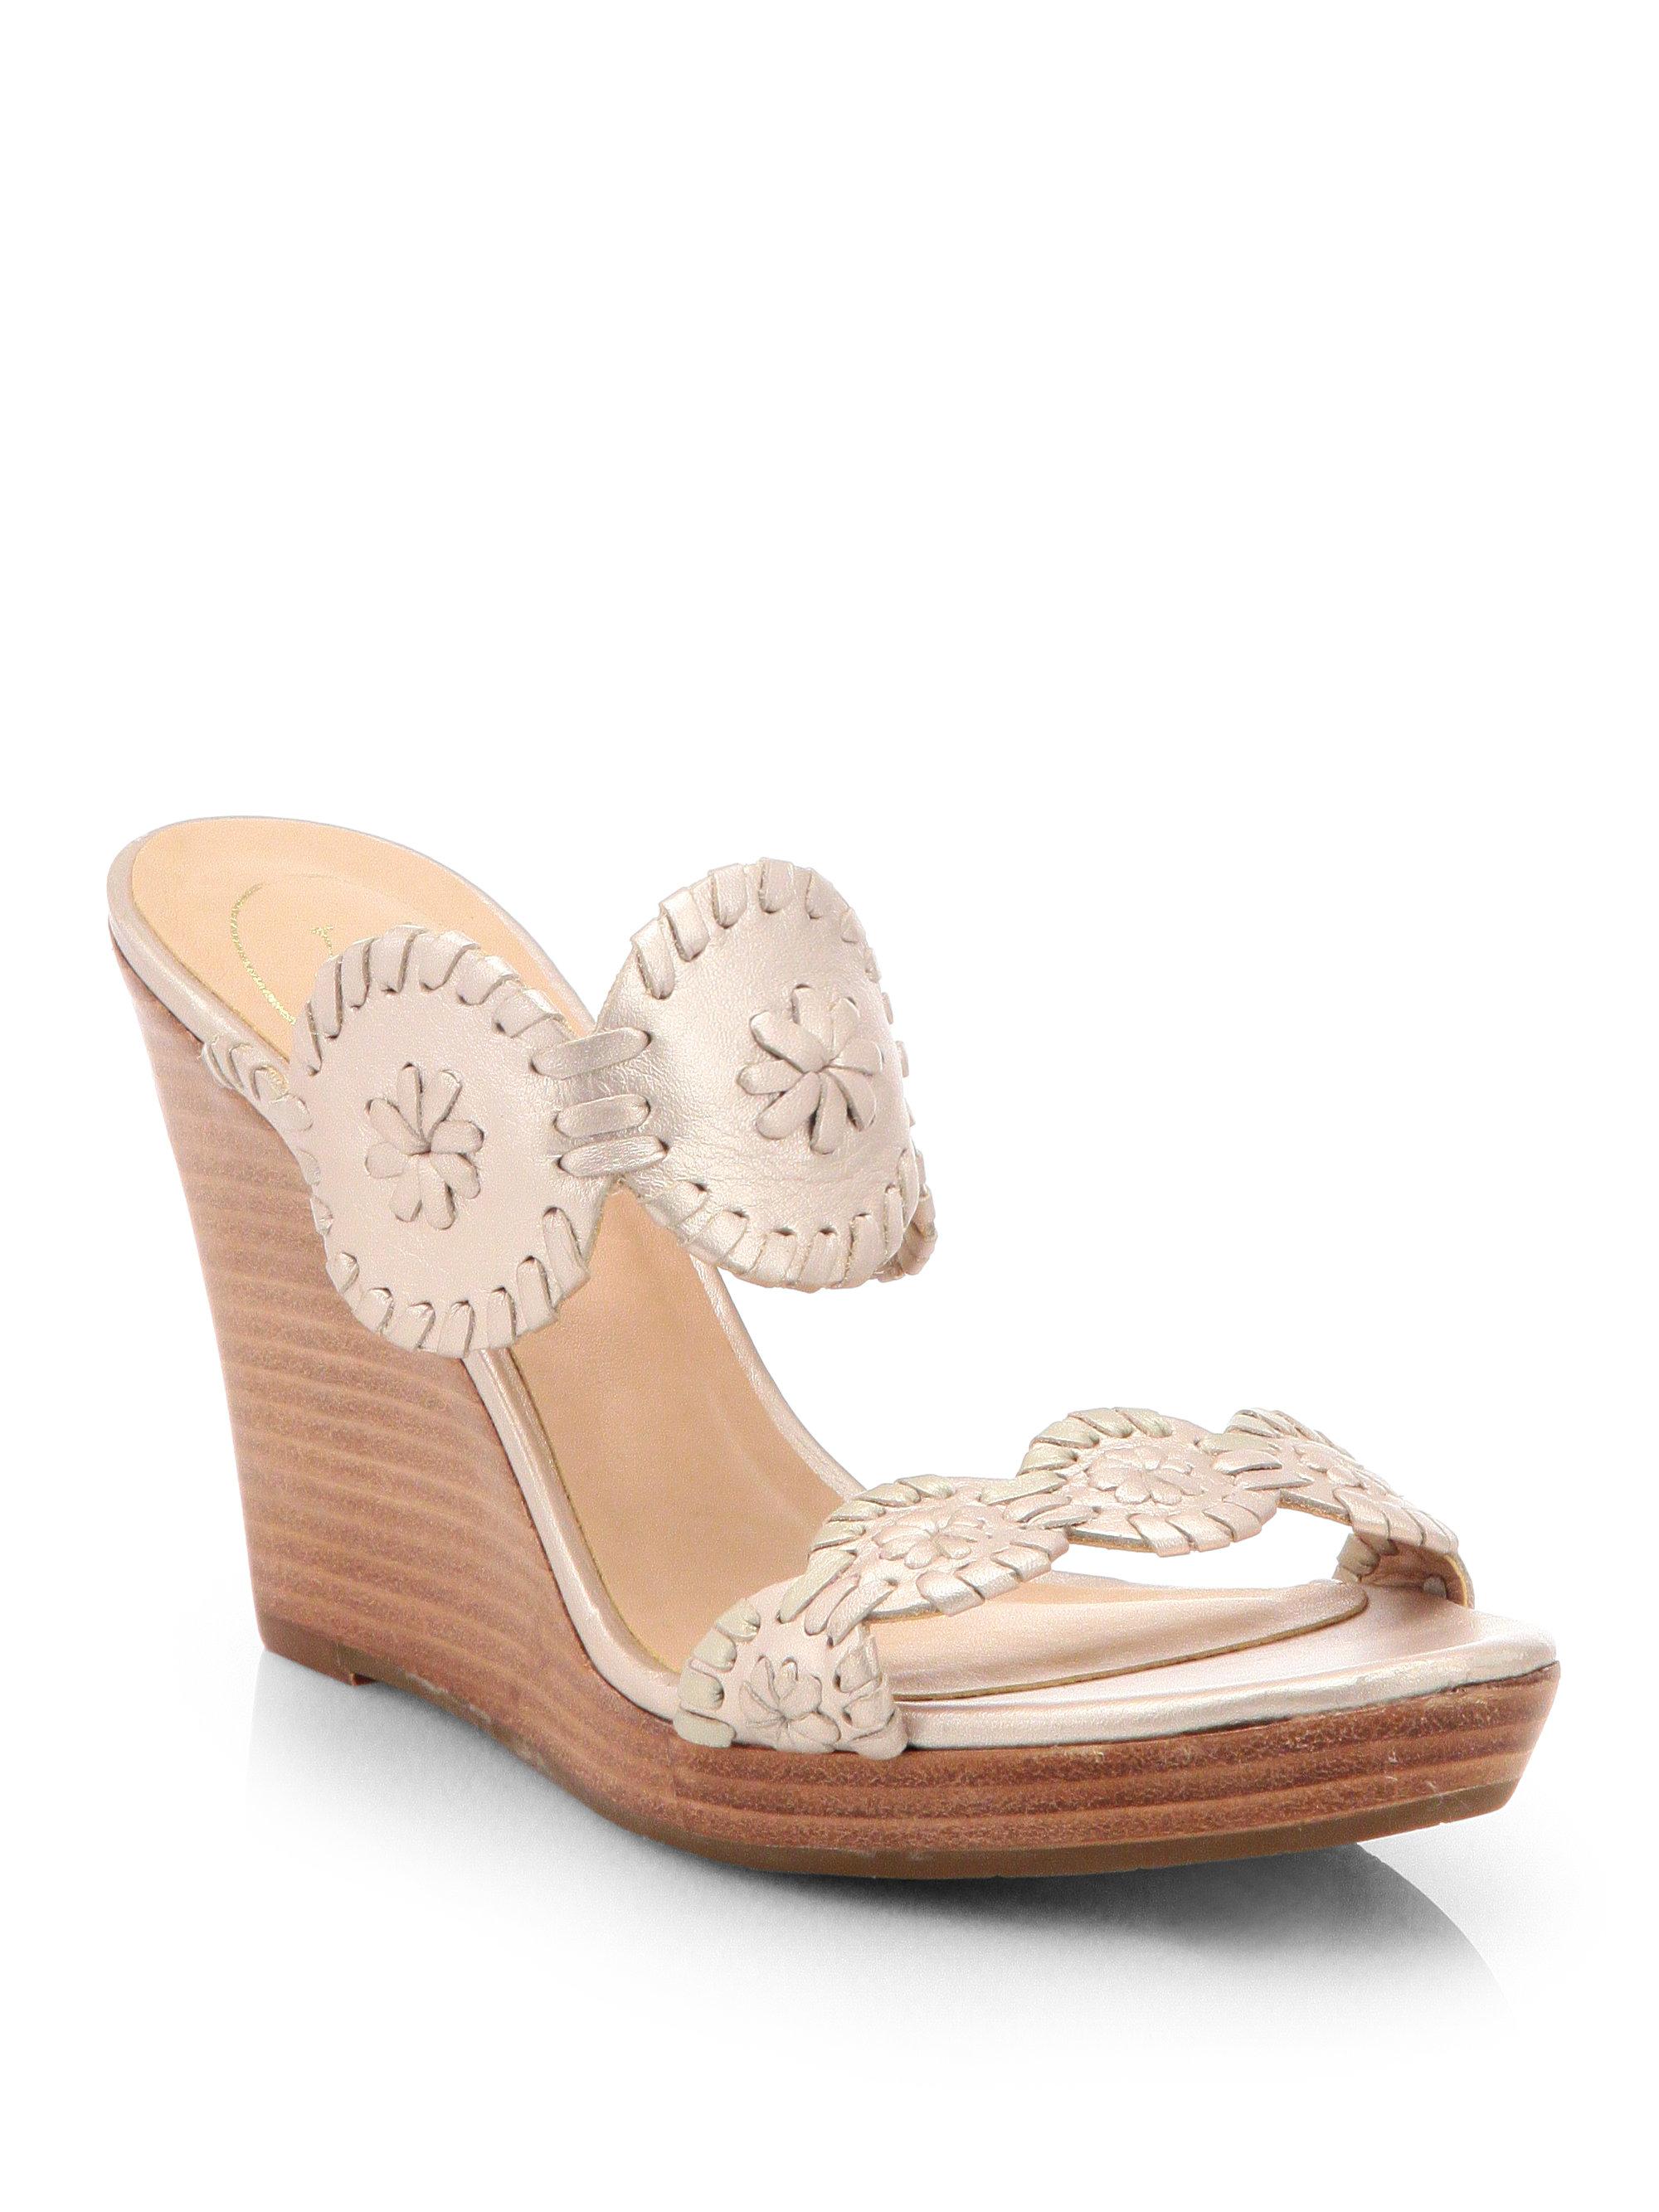 Jack Rogers Luccia Metallic Leather Platform Wedge Sandals